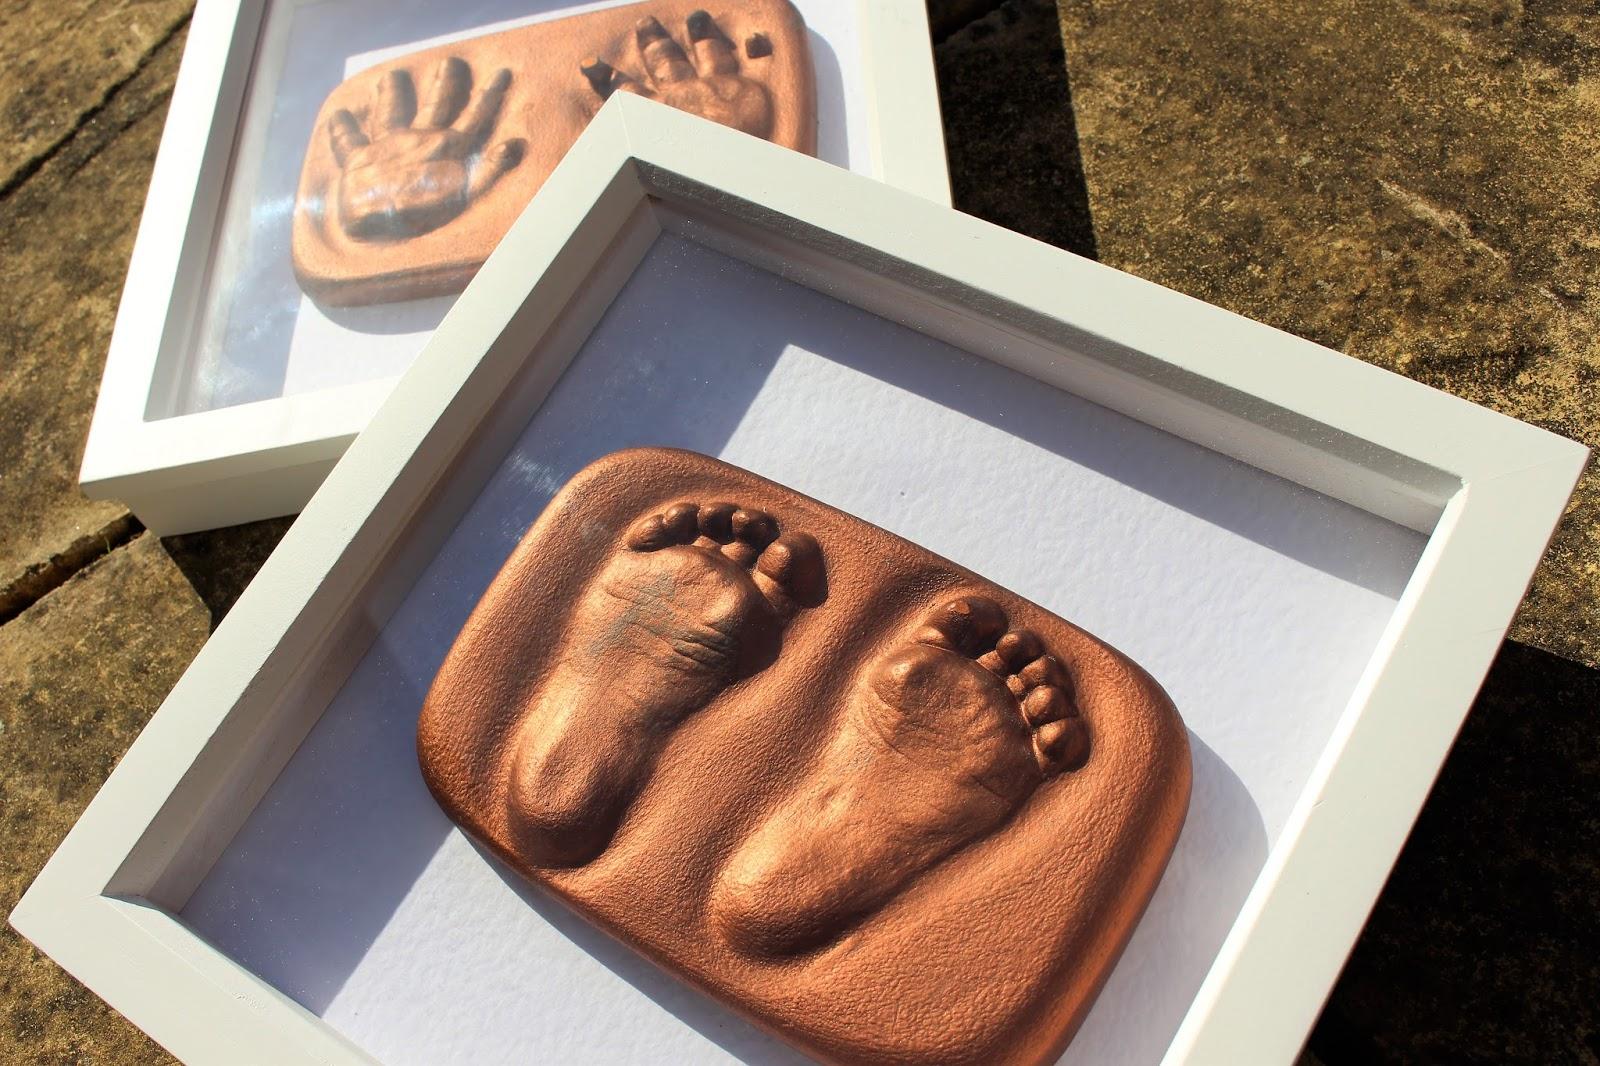 Diy i got phoebes feet hands cast itsjustmehayleyd baby foot and hand casting solutioingenieria Choice Image